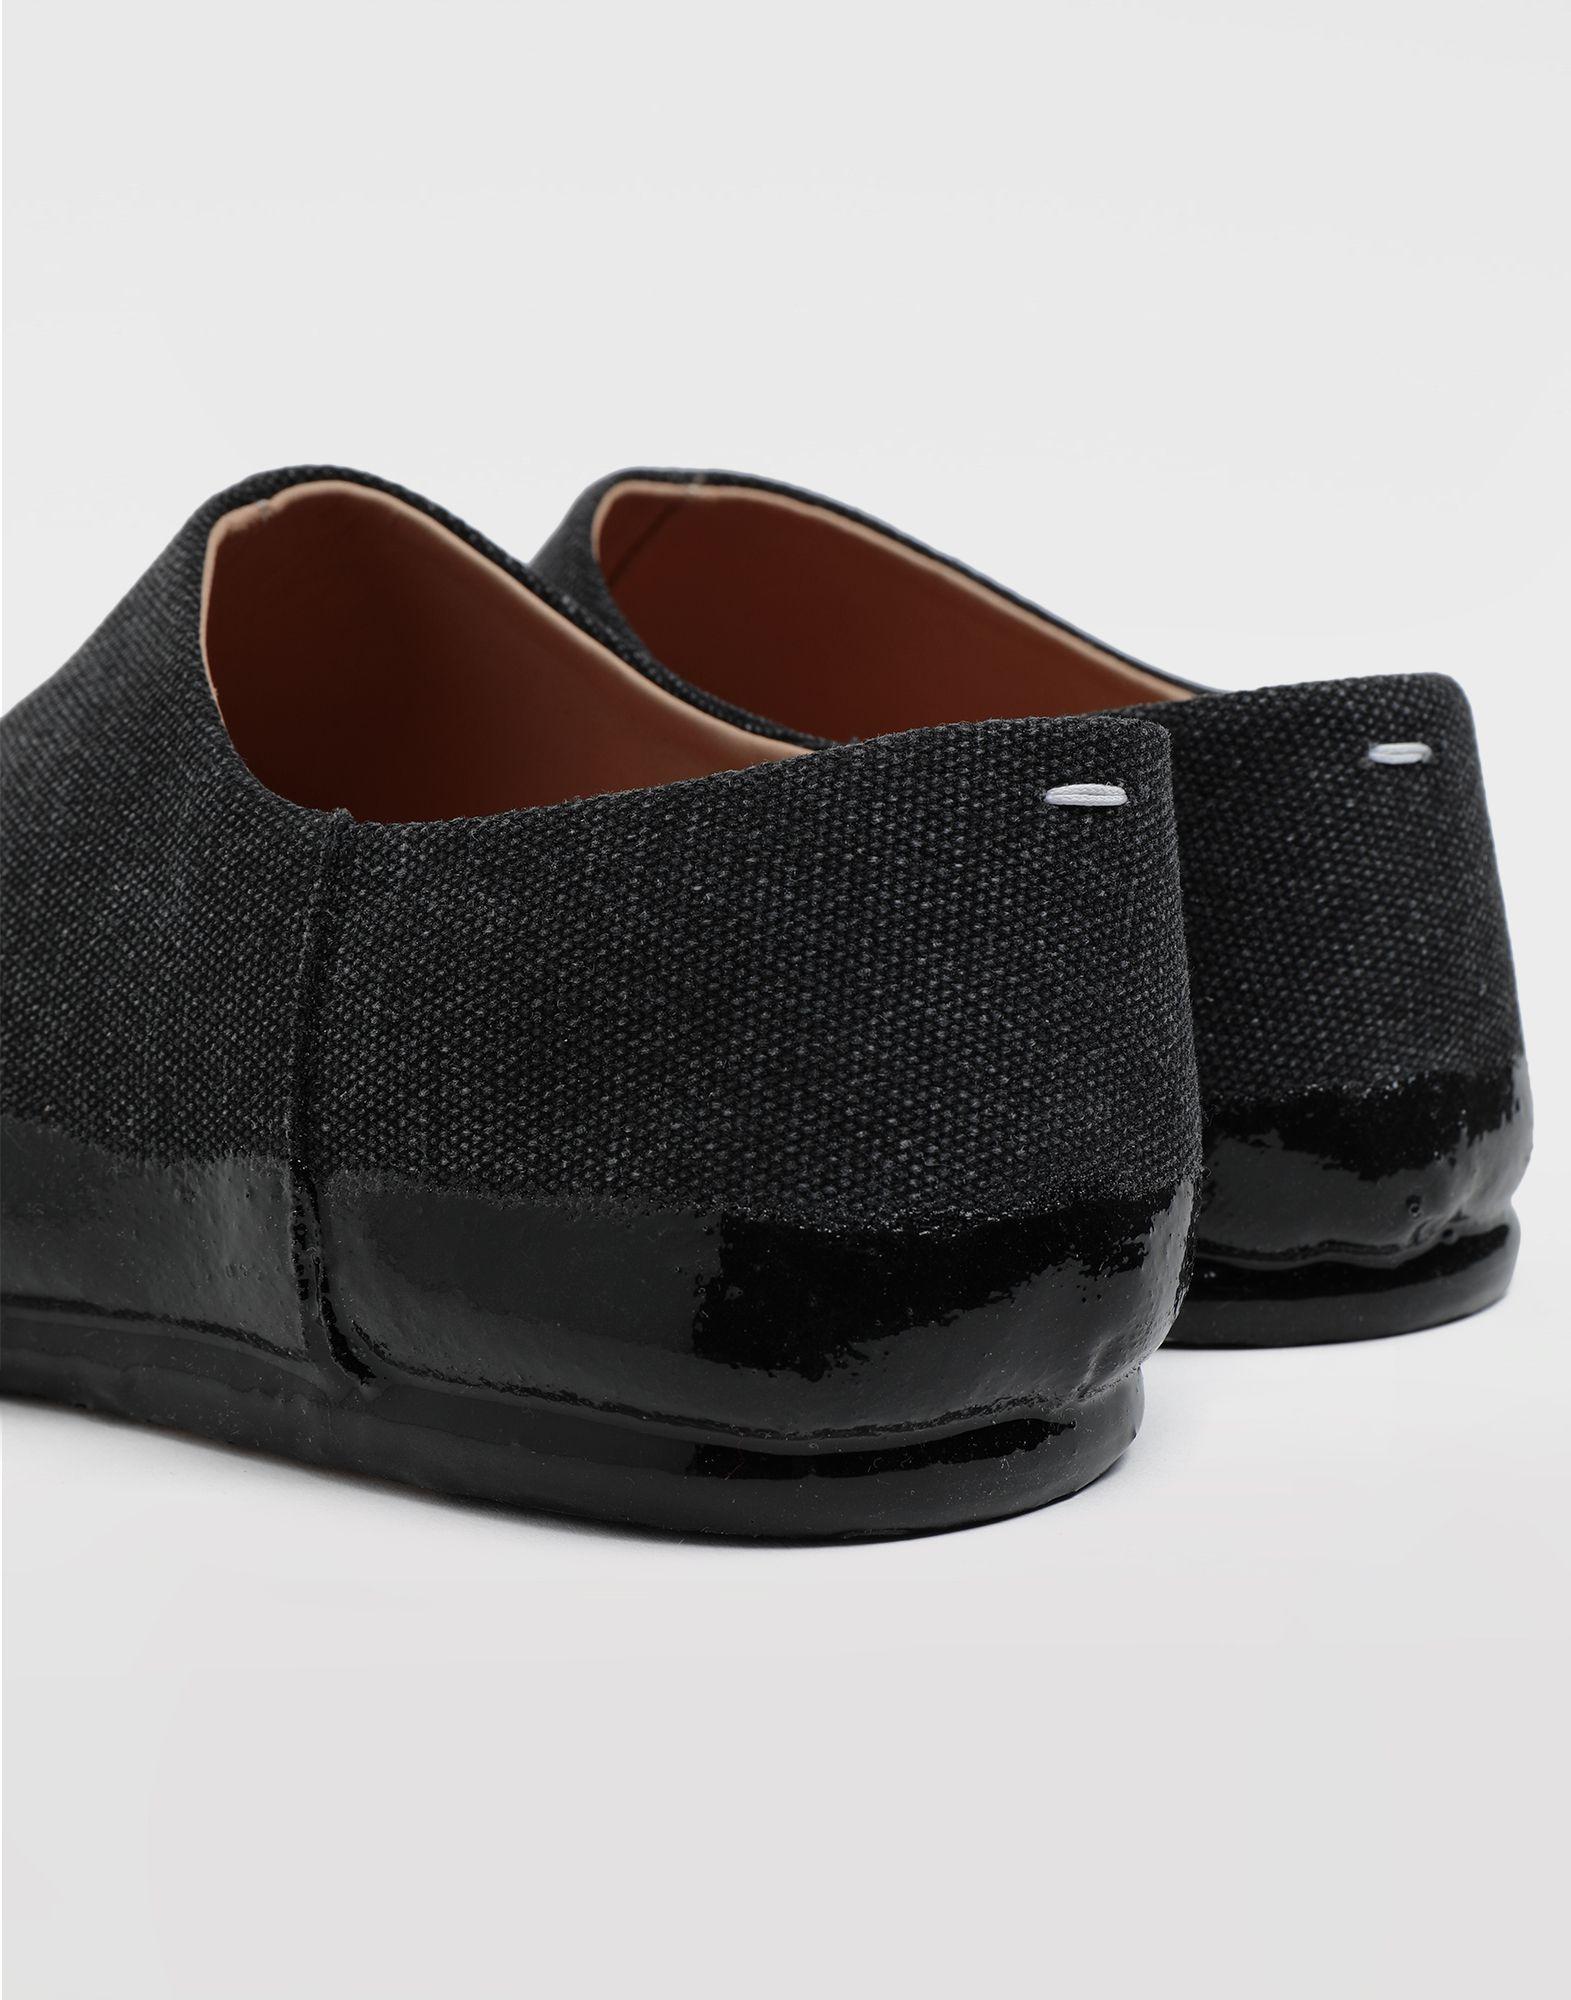 MAISON MARGIELA Chaussures slip-on Tabi finition lamée Mocassins Homme b